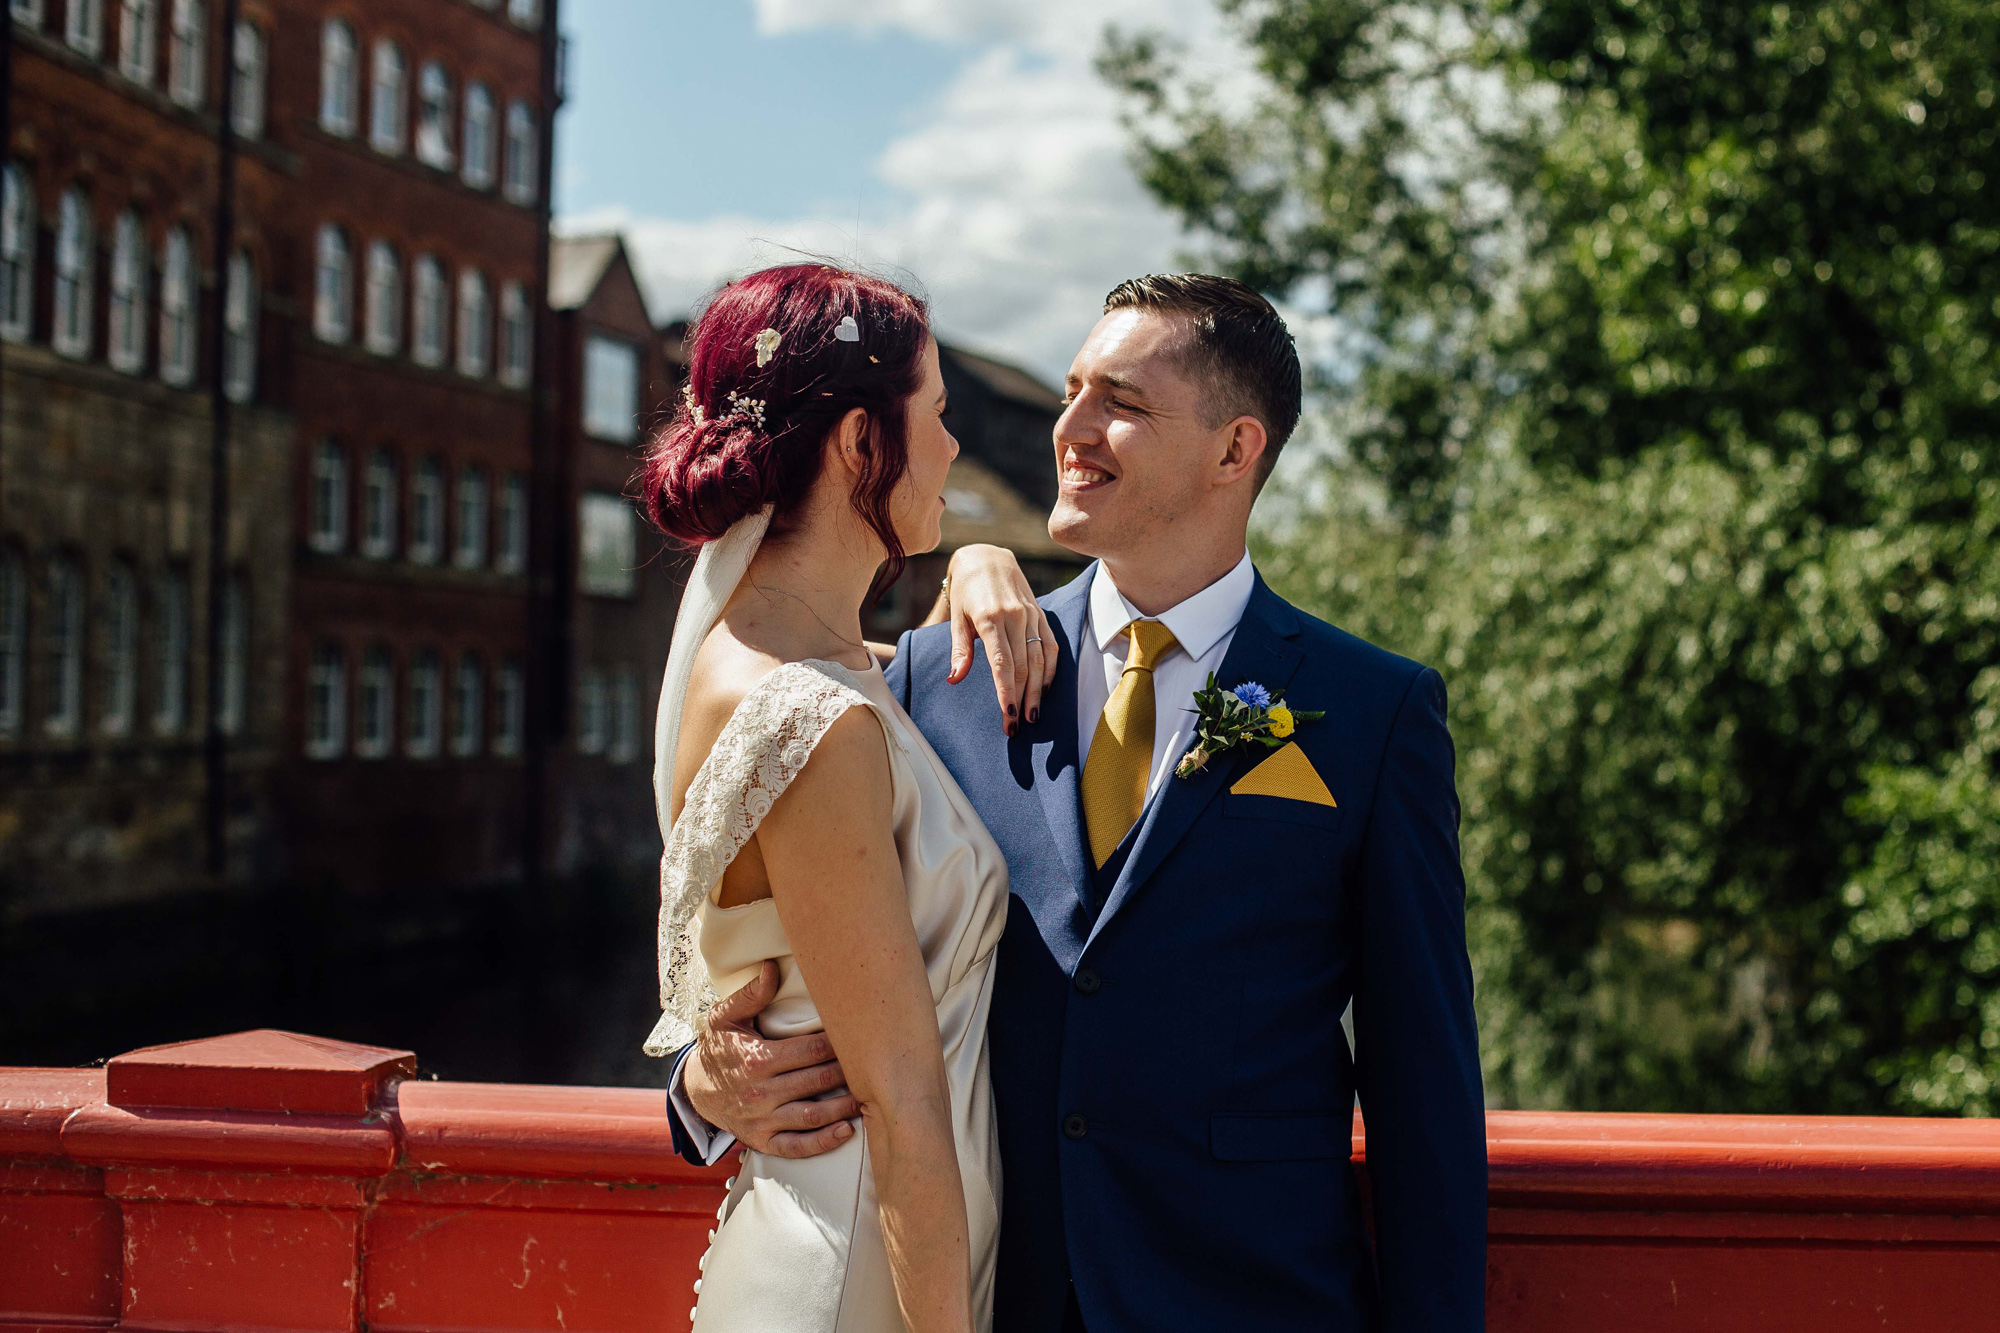 Sarah-Honeysuckle-Bias-Cut-Silk-Vintage-Inspired-Wedding-Gown-Sheffield-Wedding-Kate-Beaumont-33.jpg